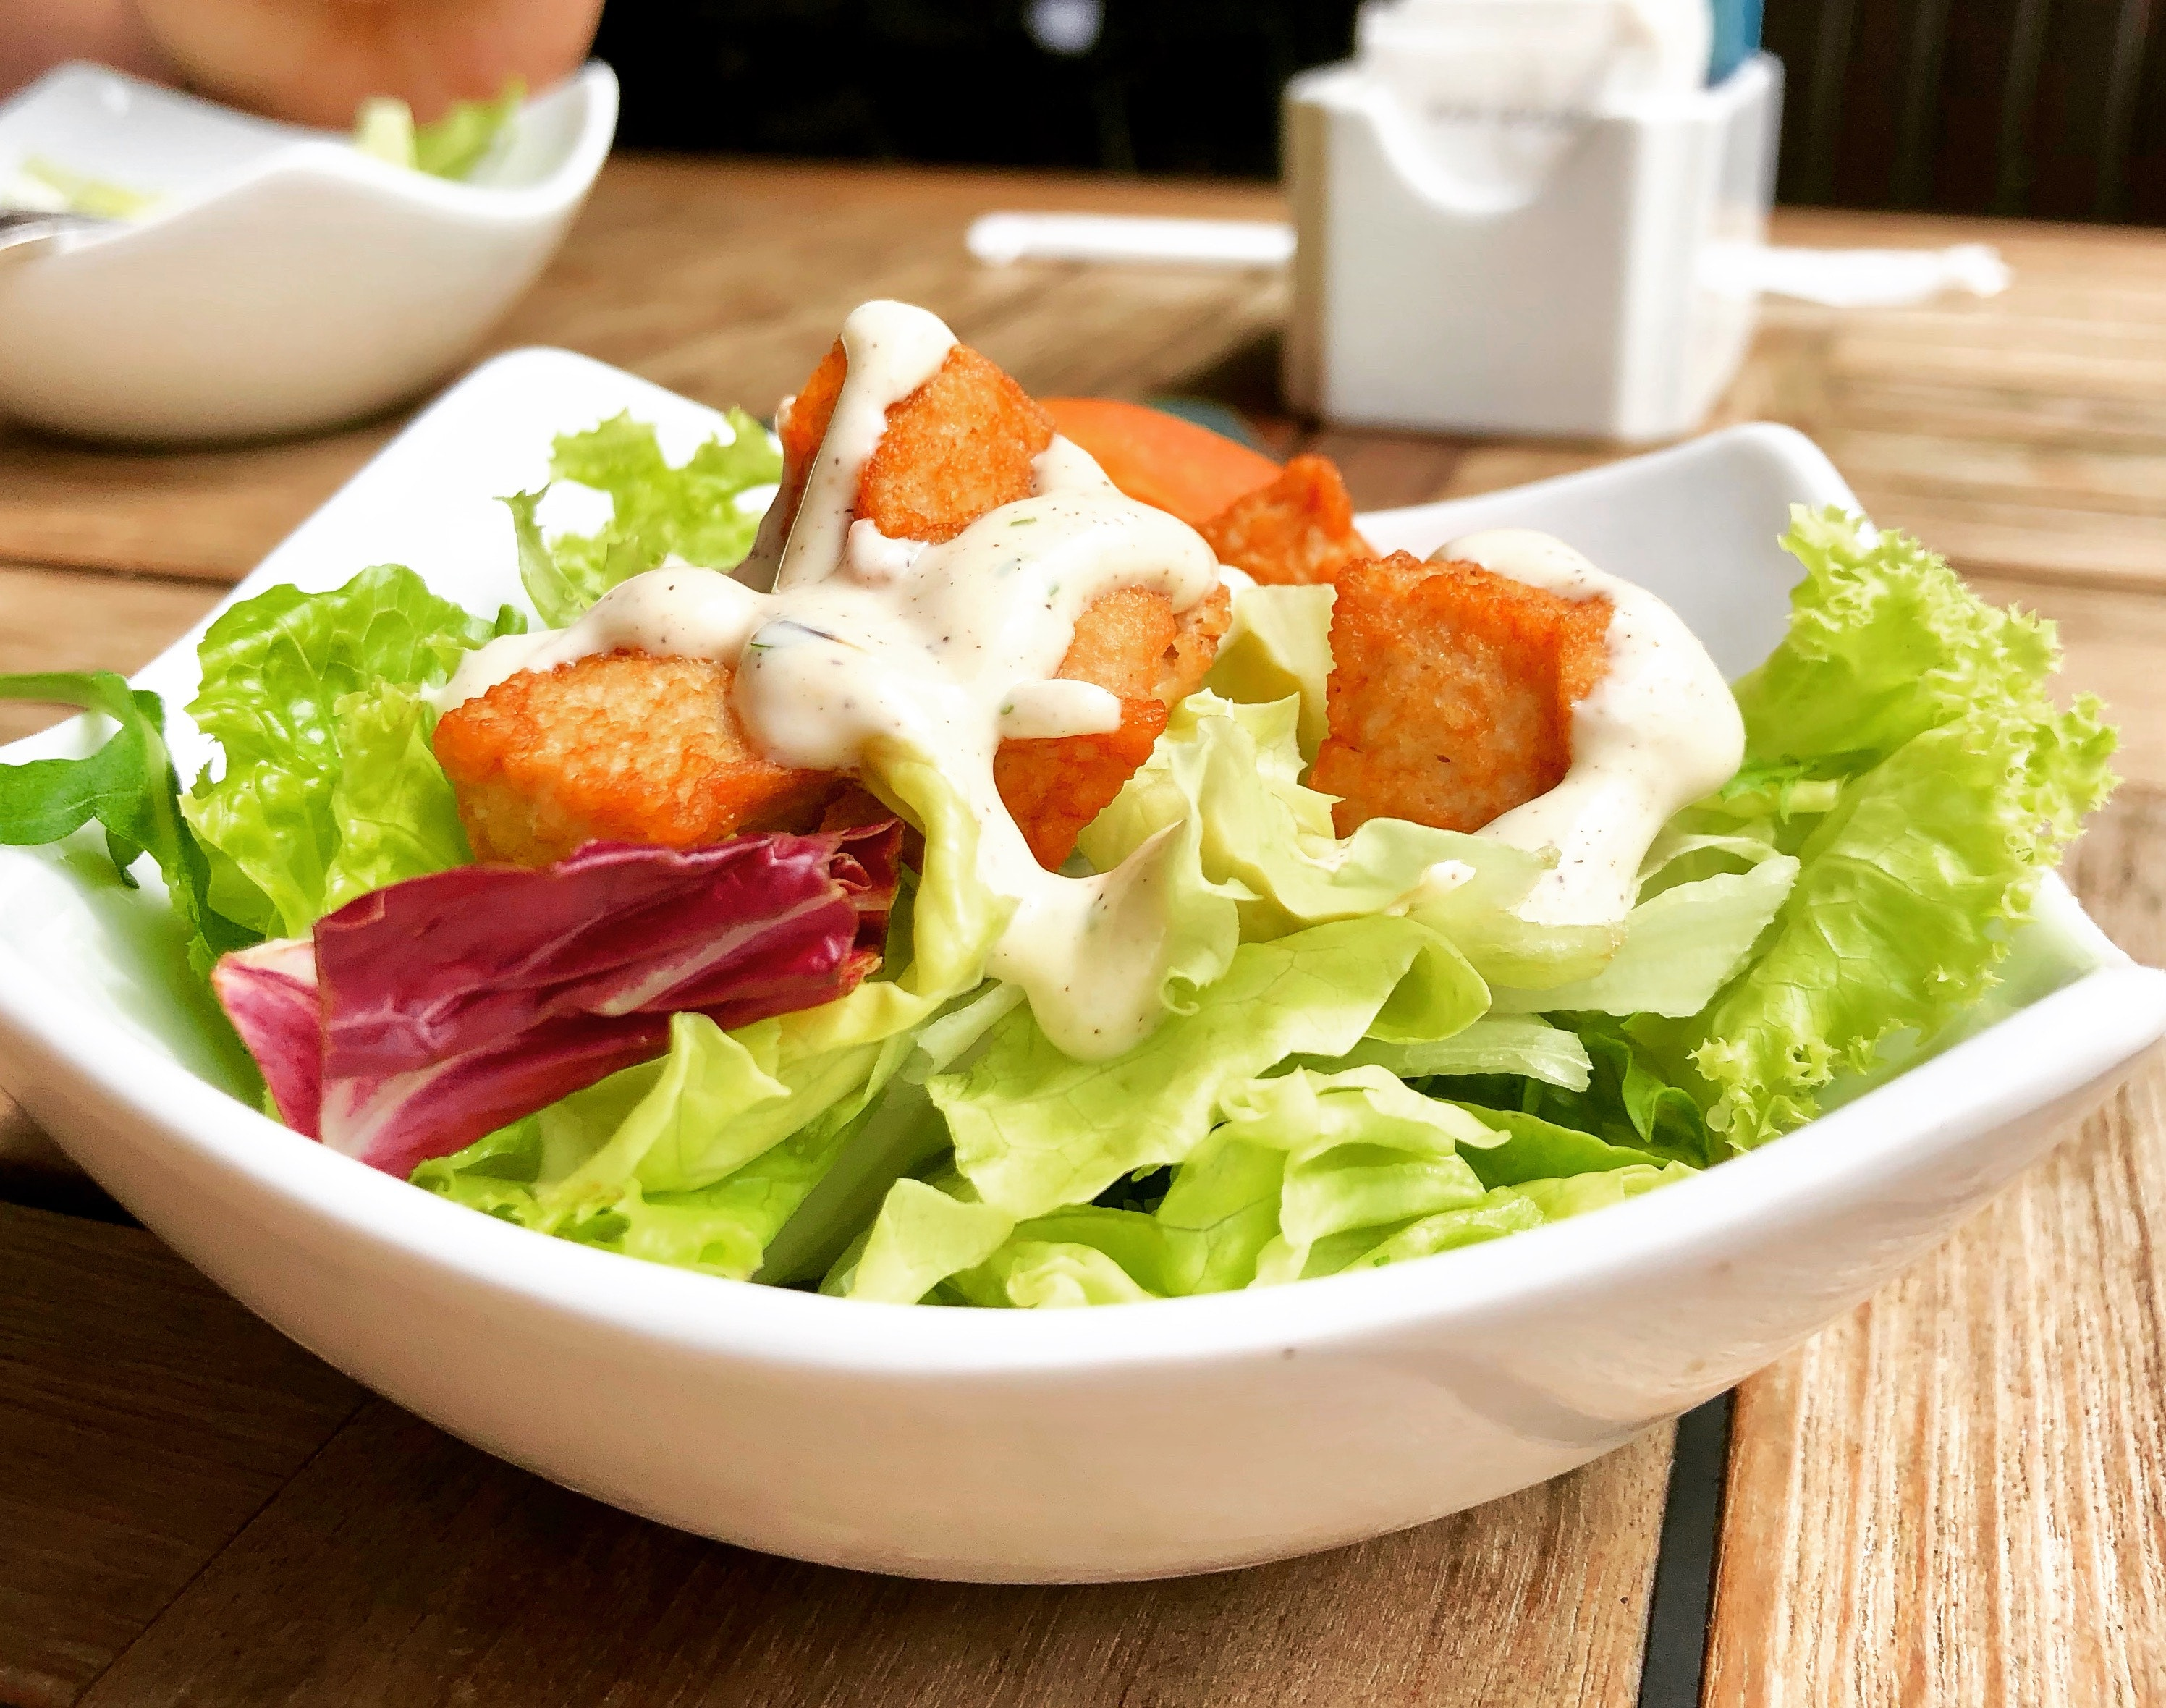 Des salades. | Photo : Pexel